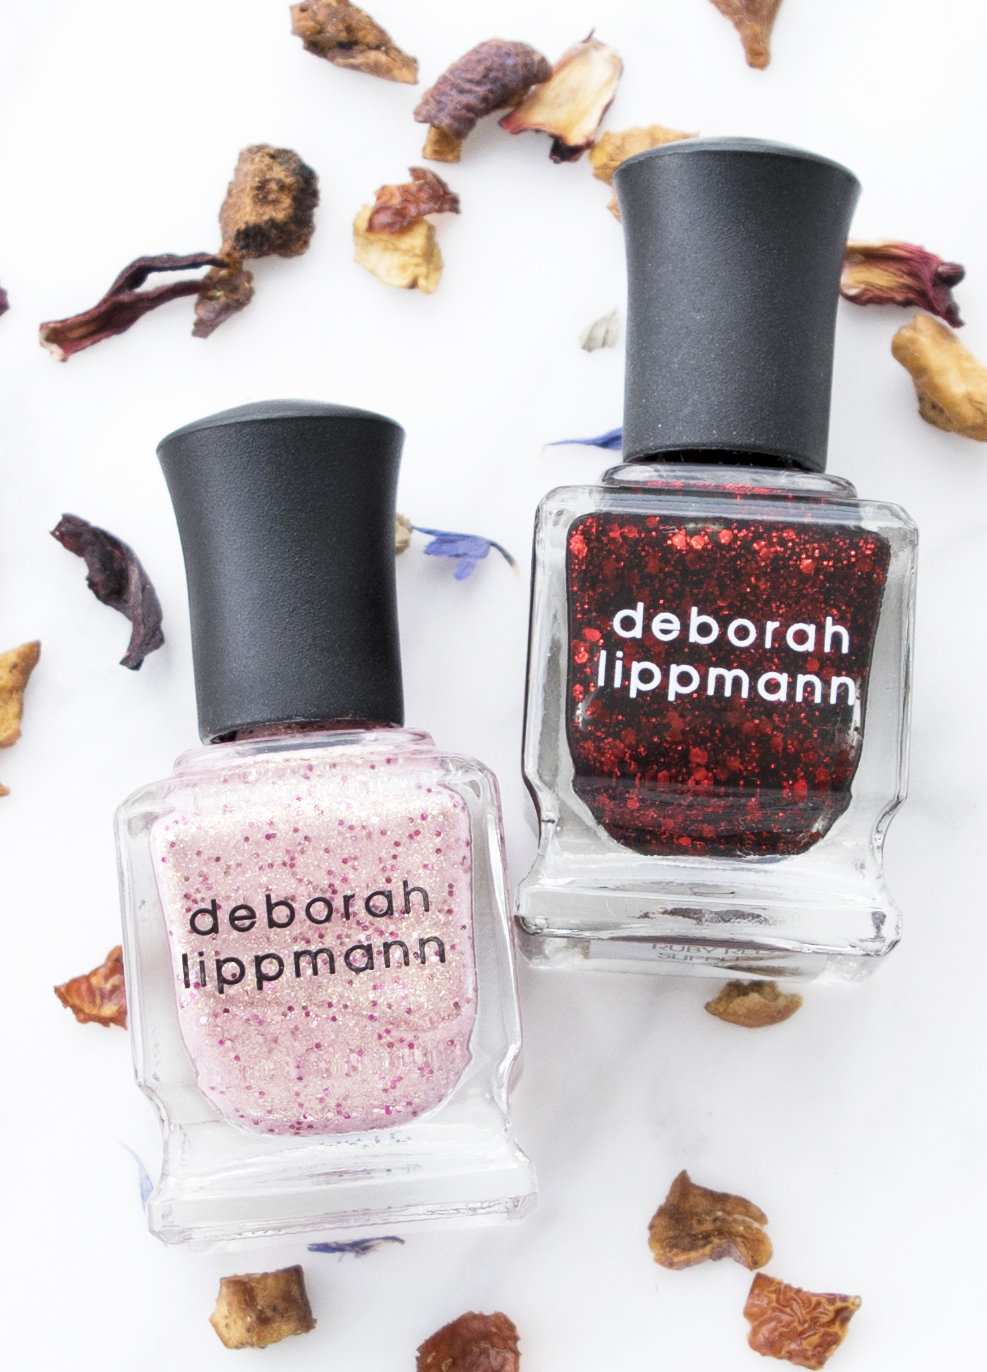 Deborah Lippmann Mermaid's Kiss Nail Polish with Ruby Red Slippers